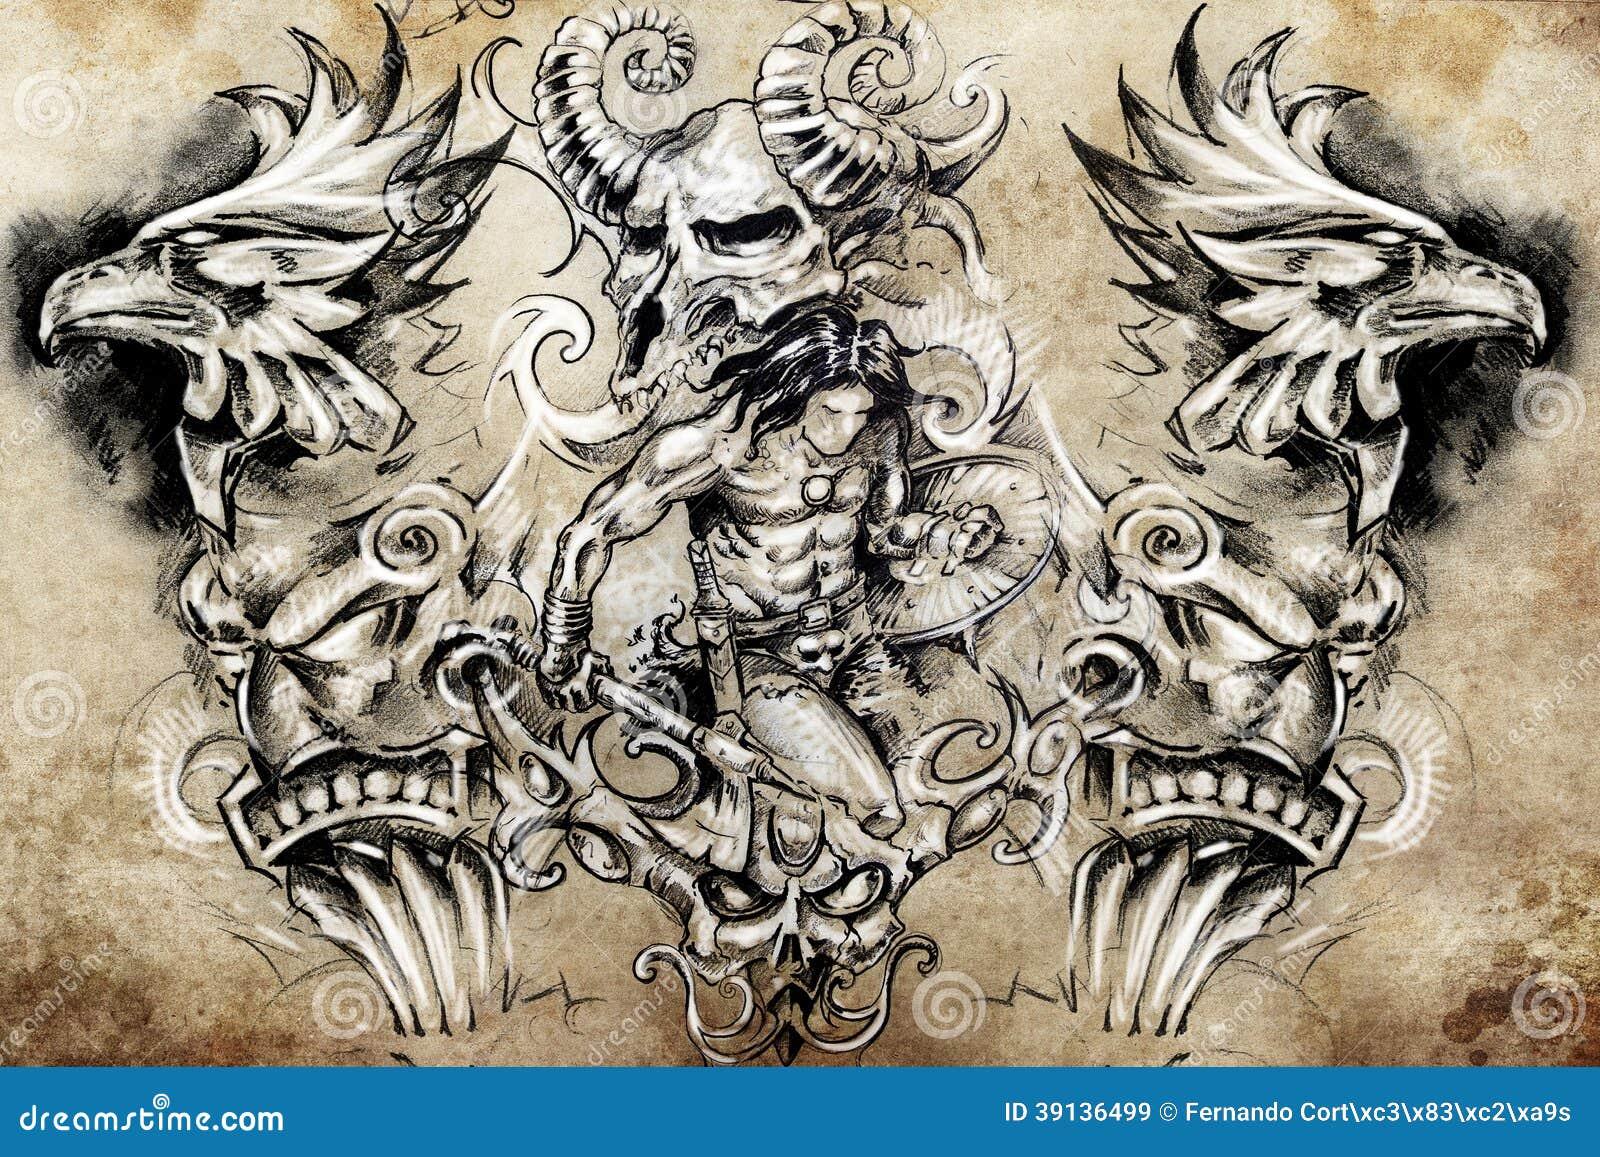 ancient warrior sketch stock illustration image